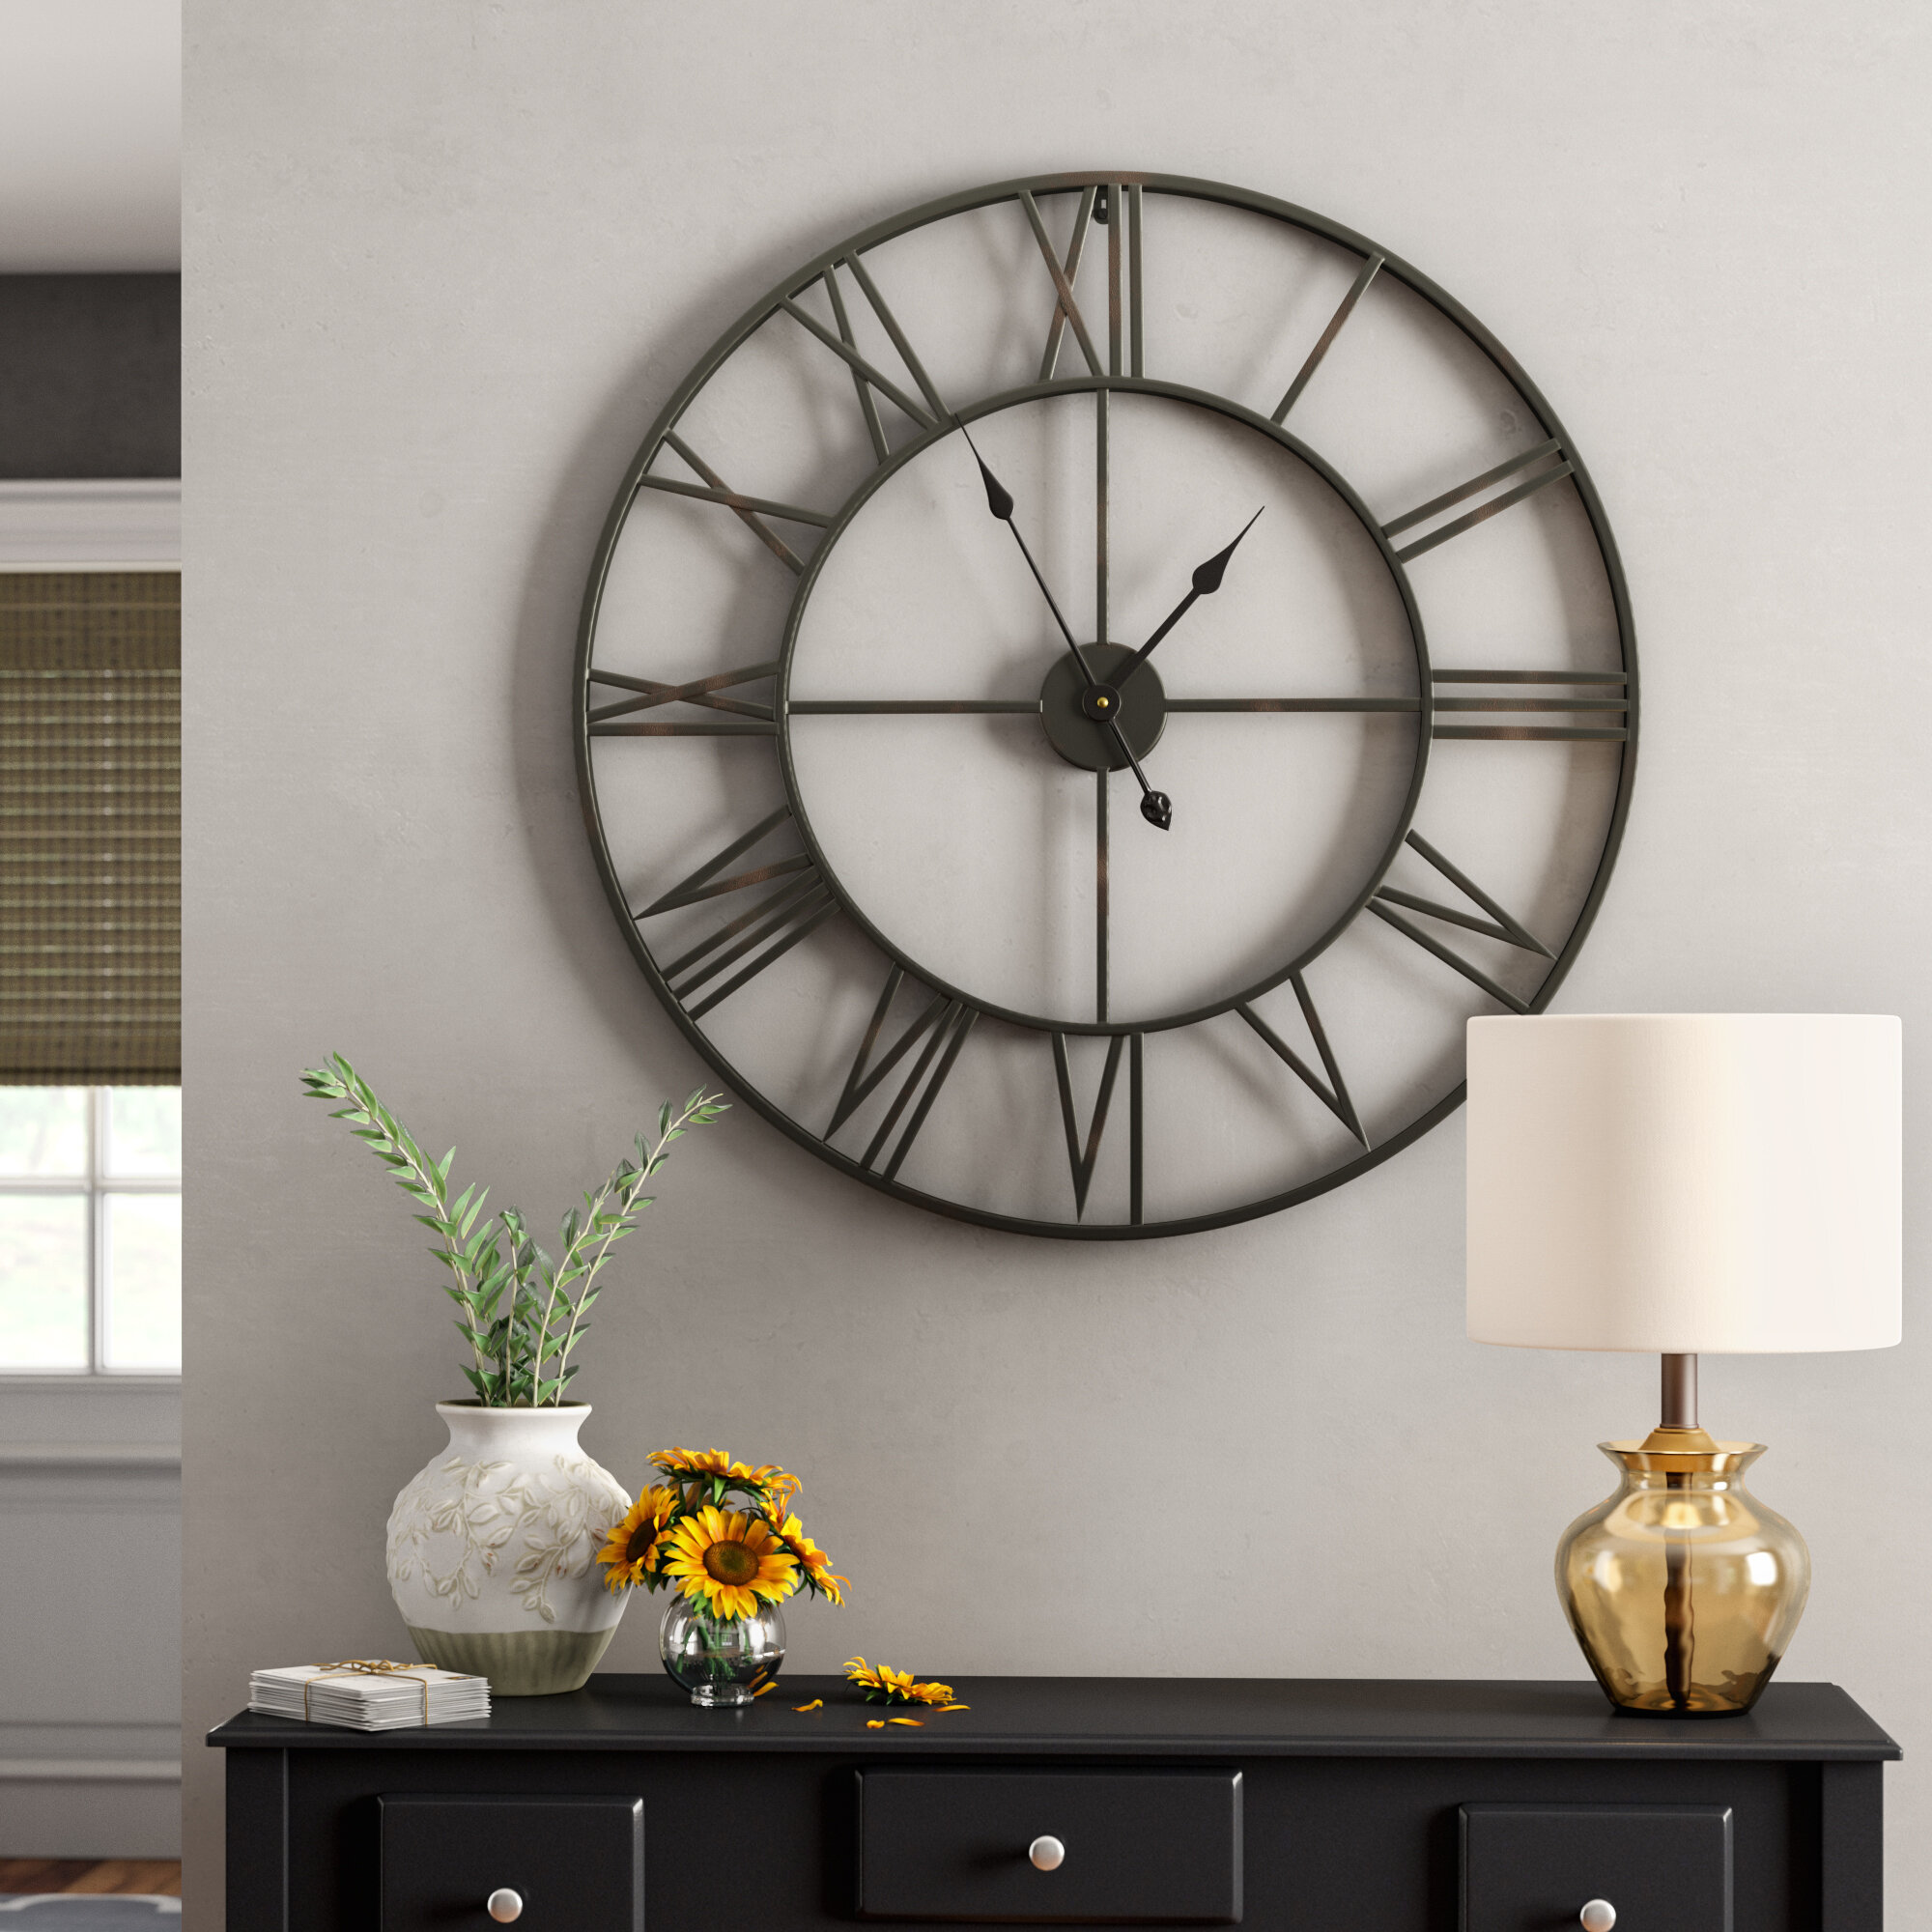 Oversized elborough roman no iron wall clock